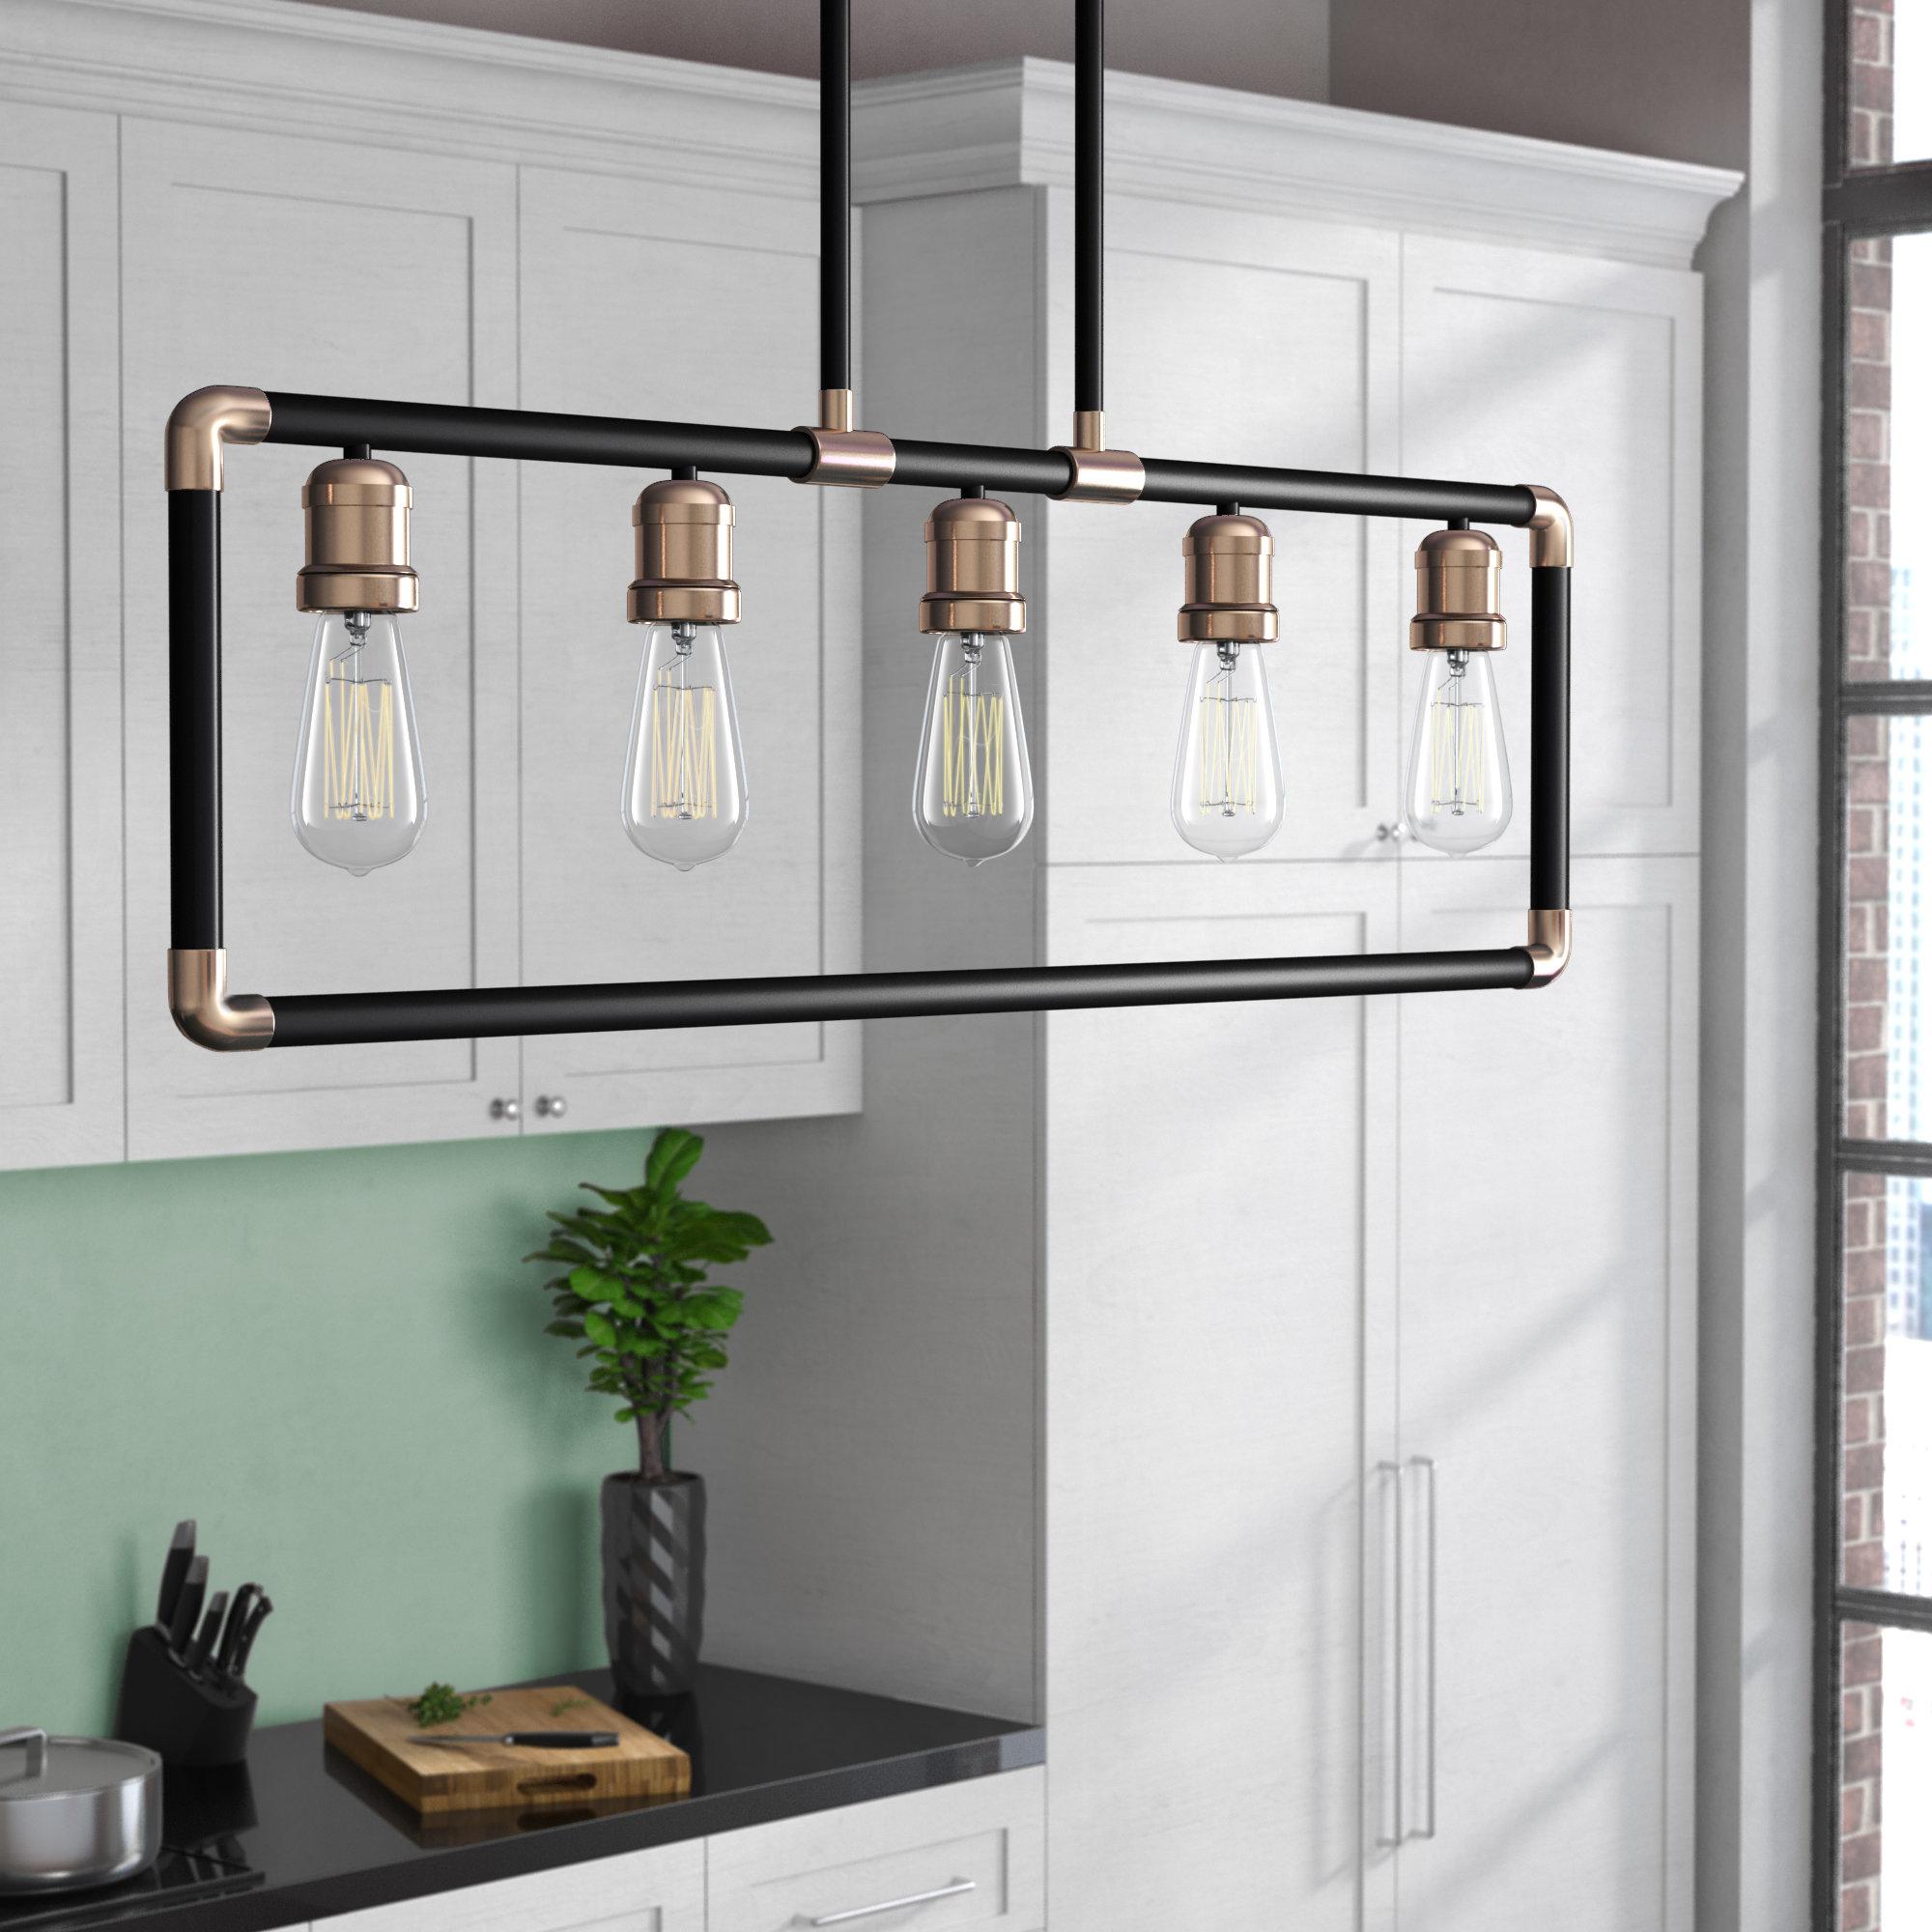 2019 Jefferson 4 Light Kitchen Island Linear Pendants For Abree 5 Light Kitchen Island Pendant (View 1 of 20)